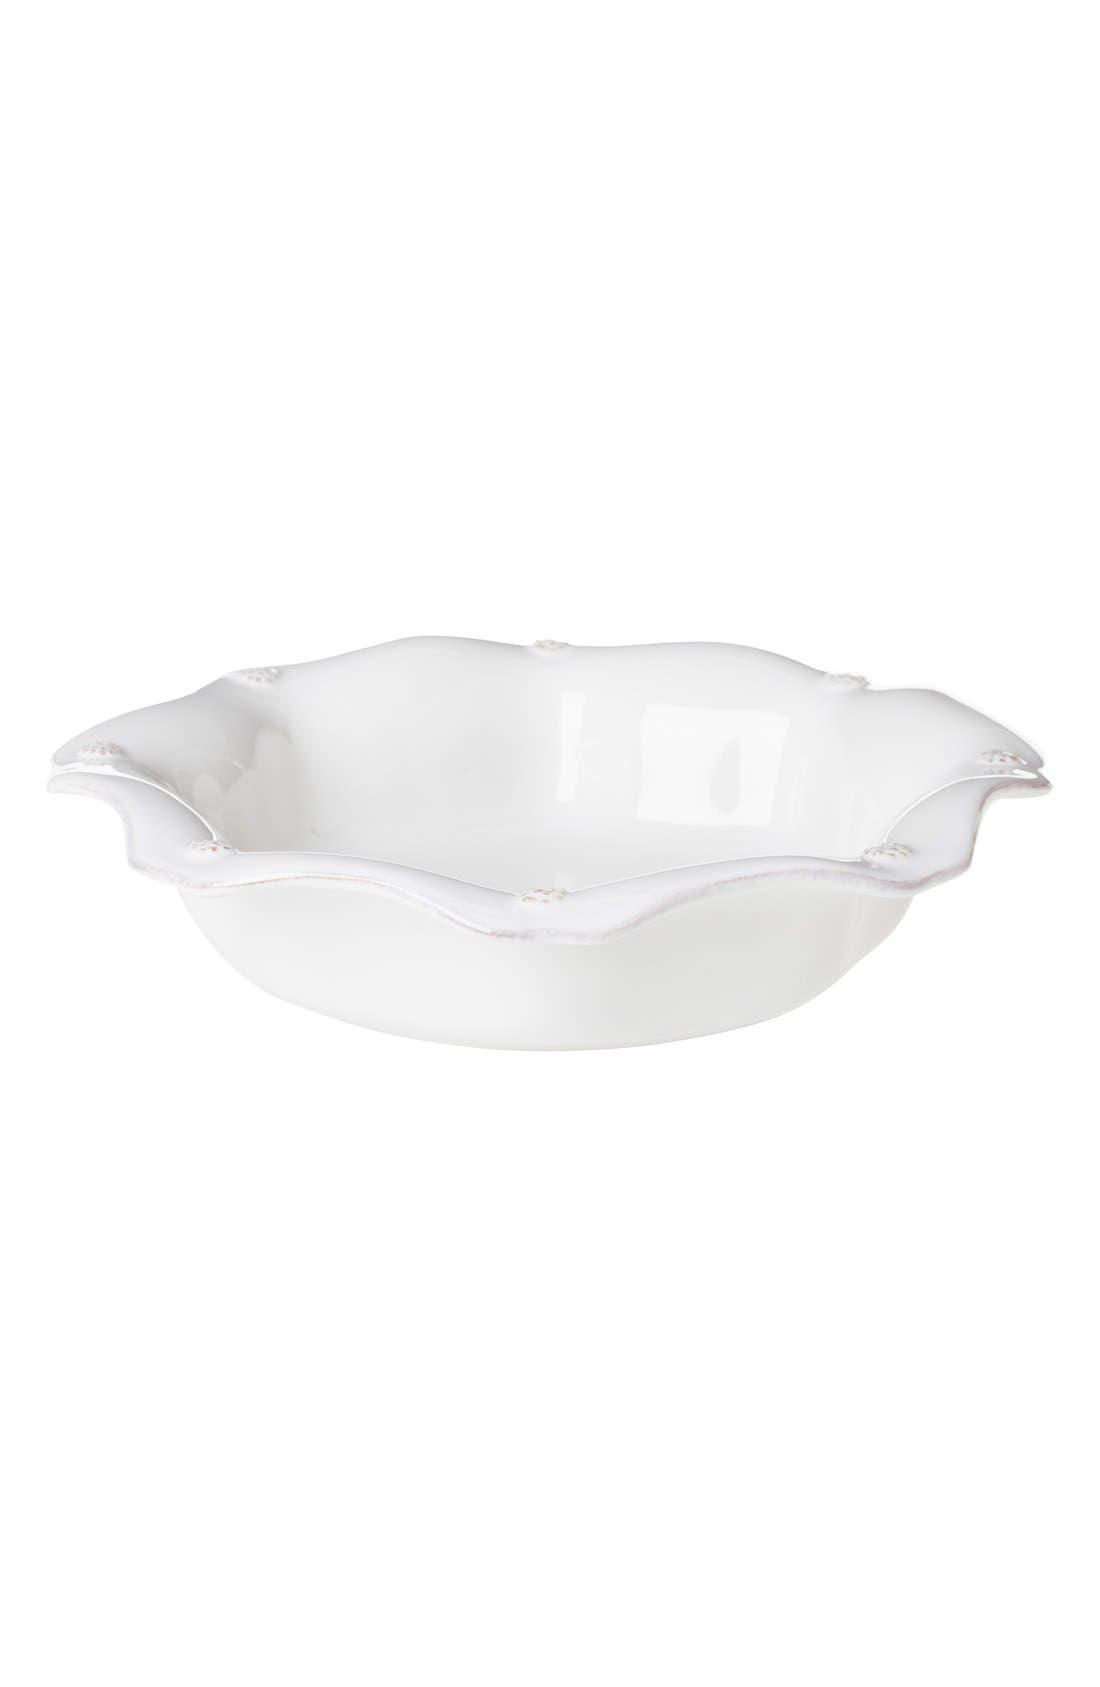 Alternate Image 1 Selected - Juliska 'Berry and Thread' Scallop Pasta Bowl